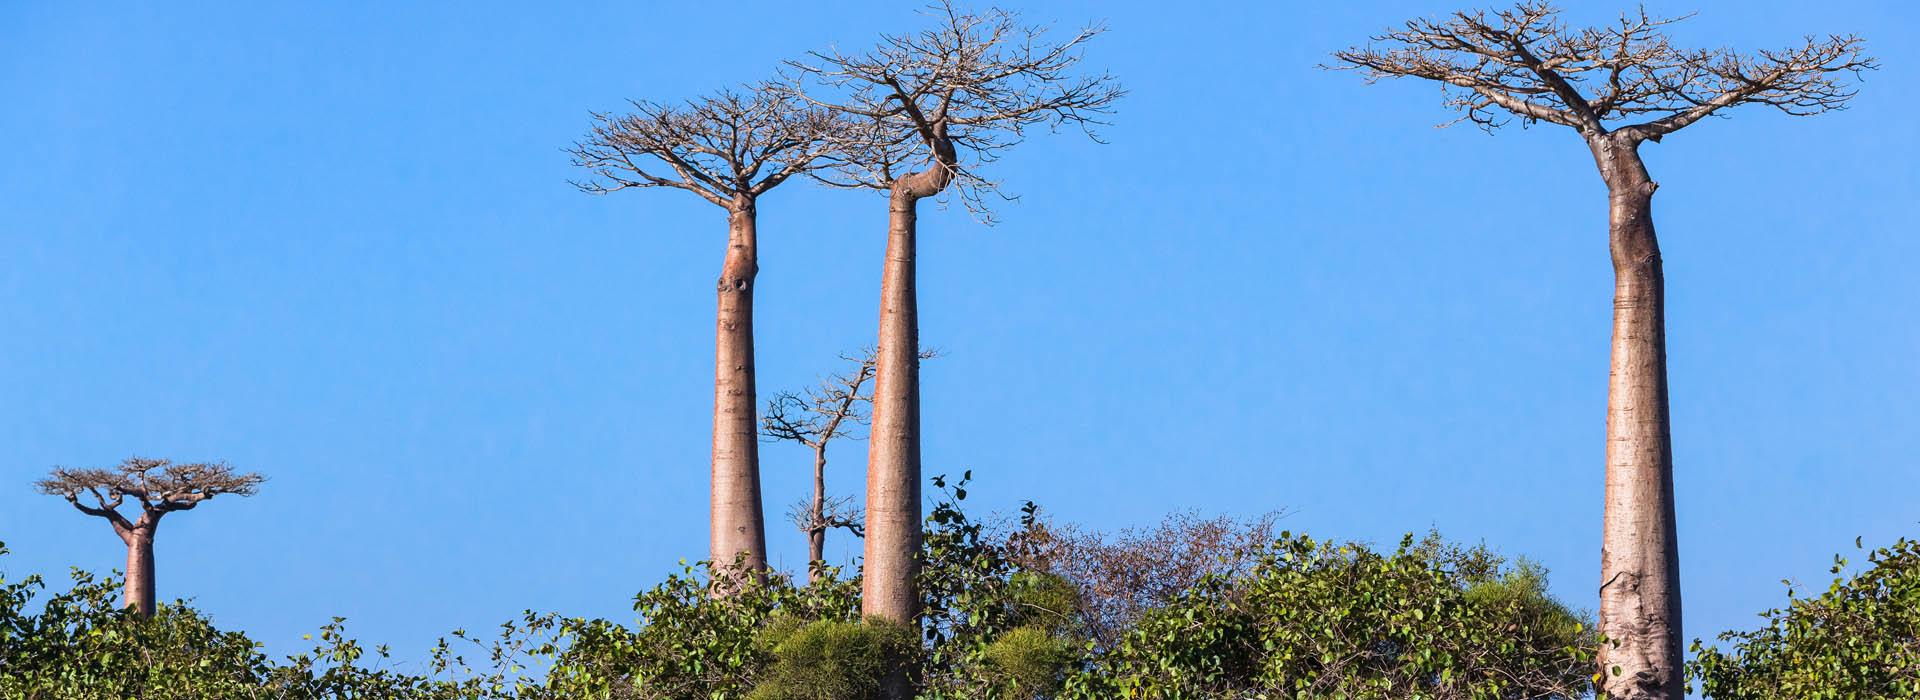 Madagascar Top Destinations - African Adventure Specialists 2